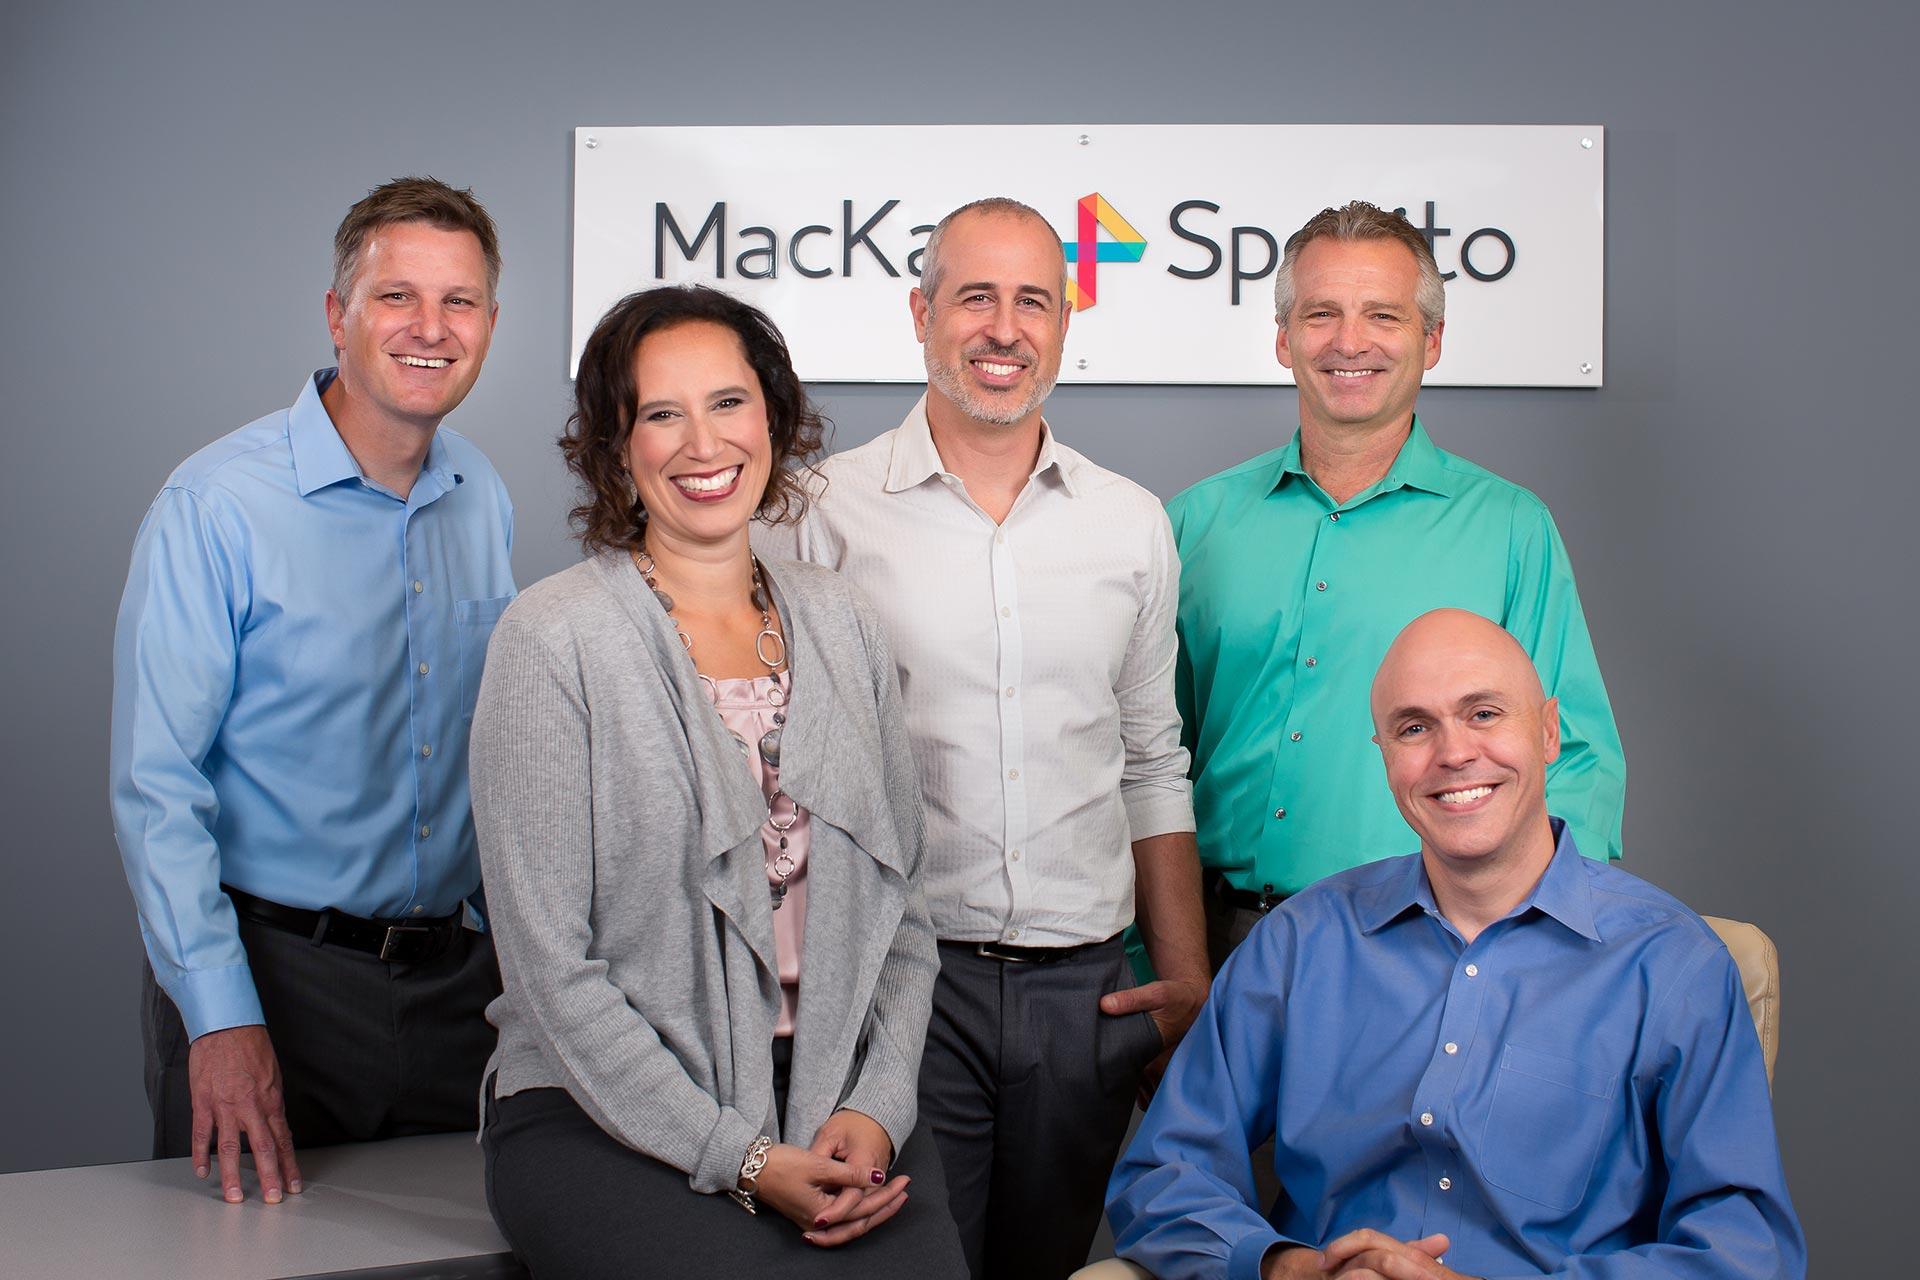 MacKay Sposito Partner Group